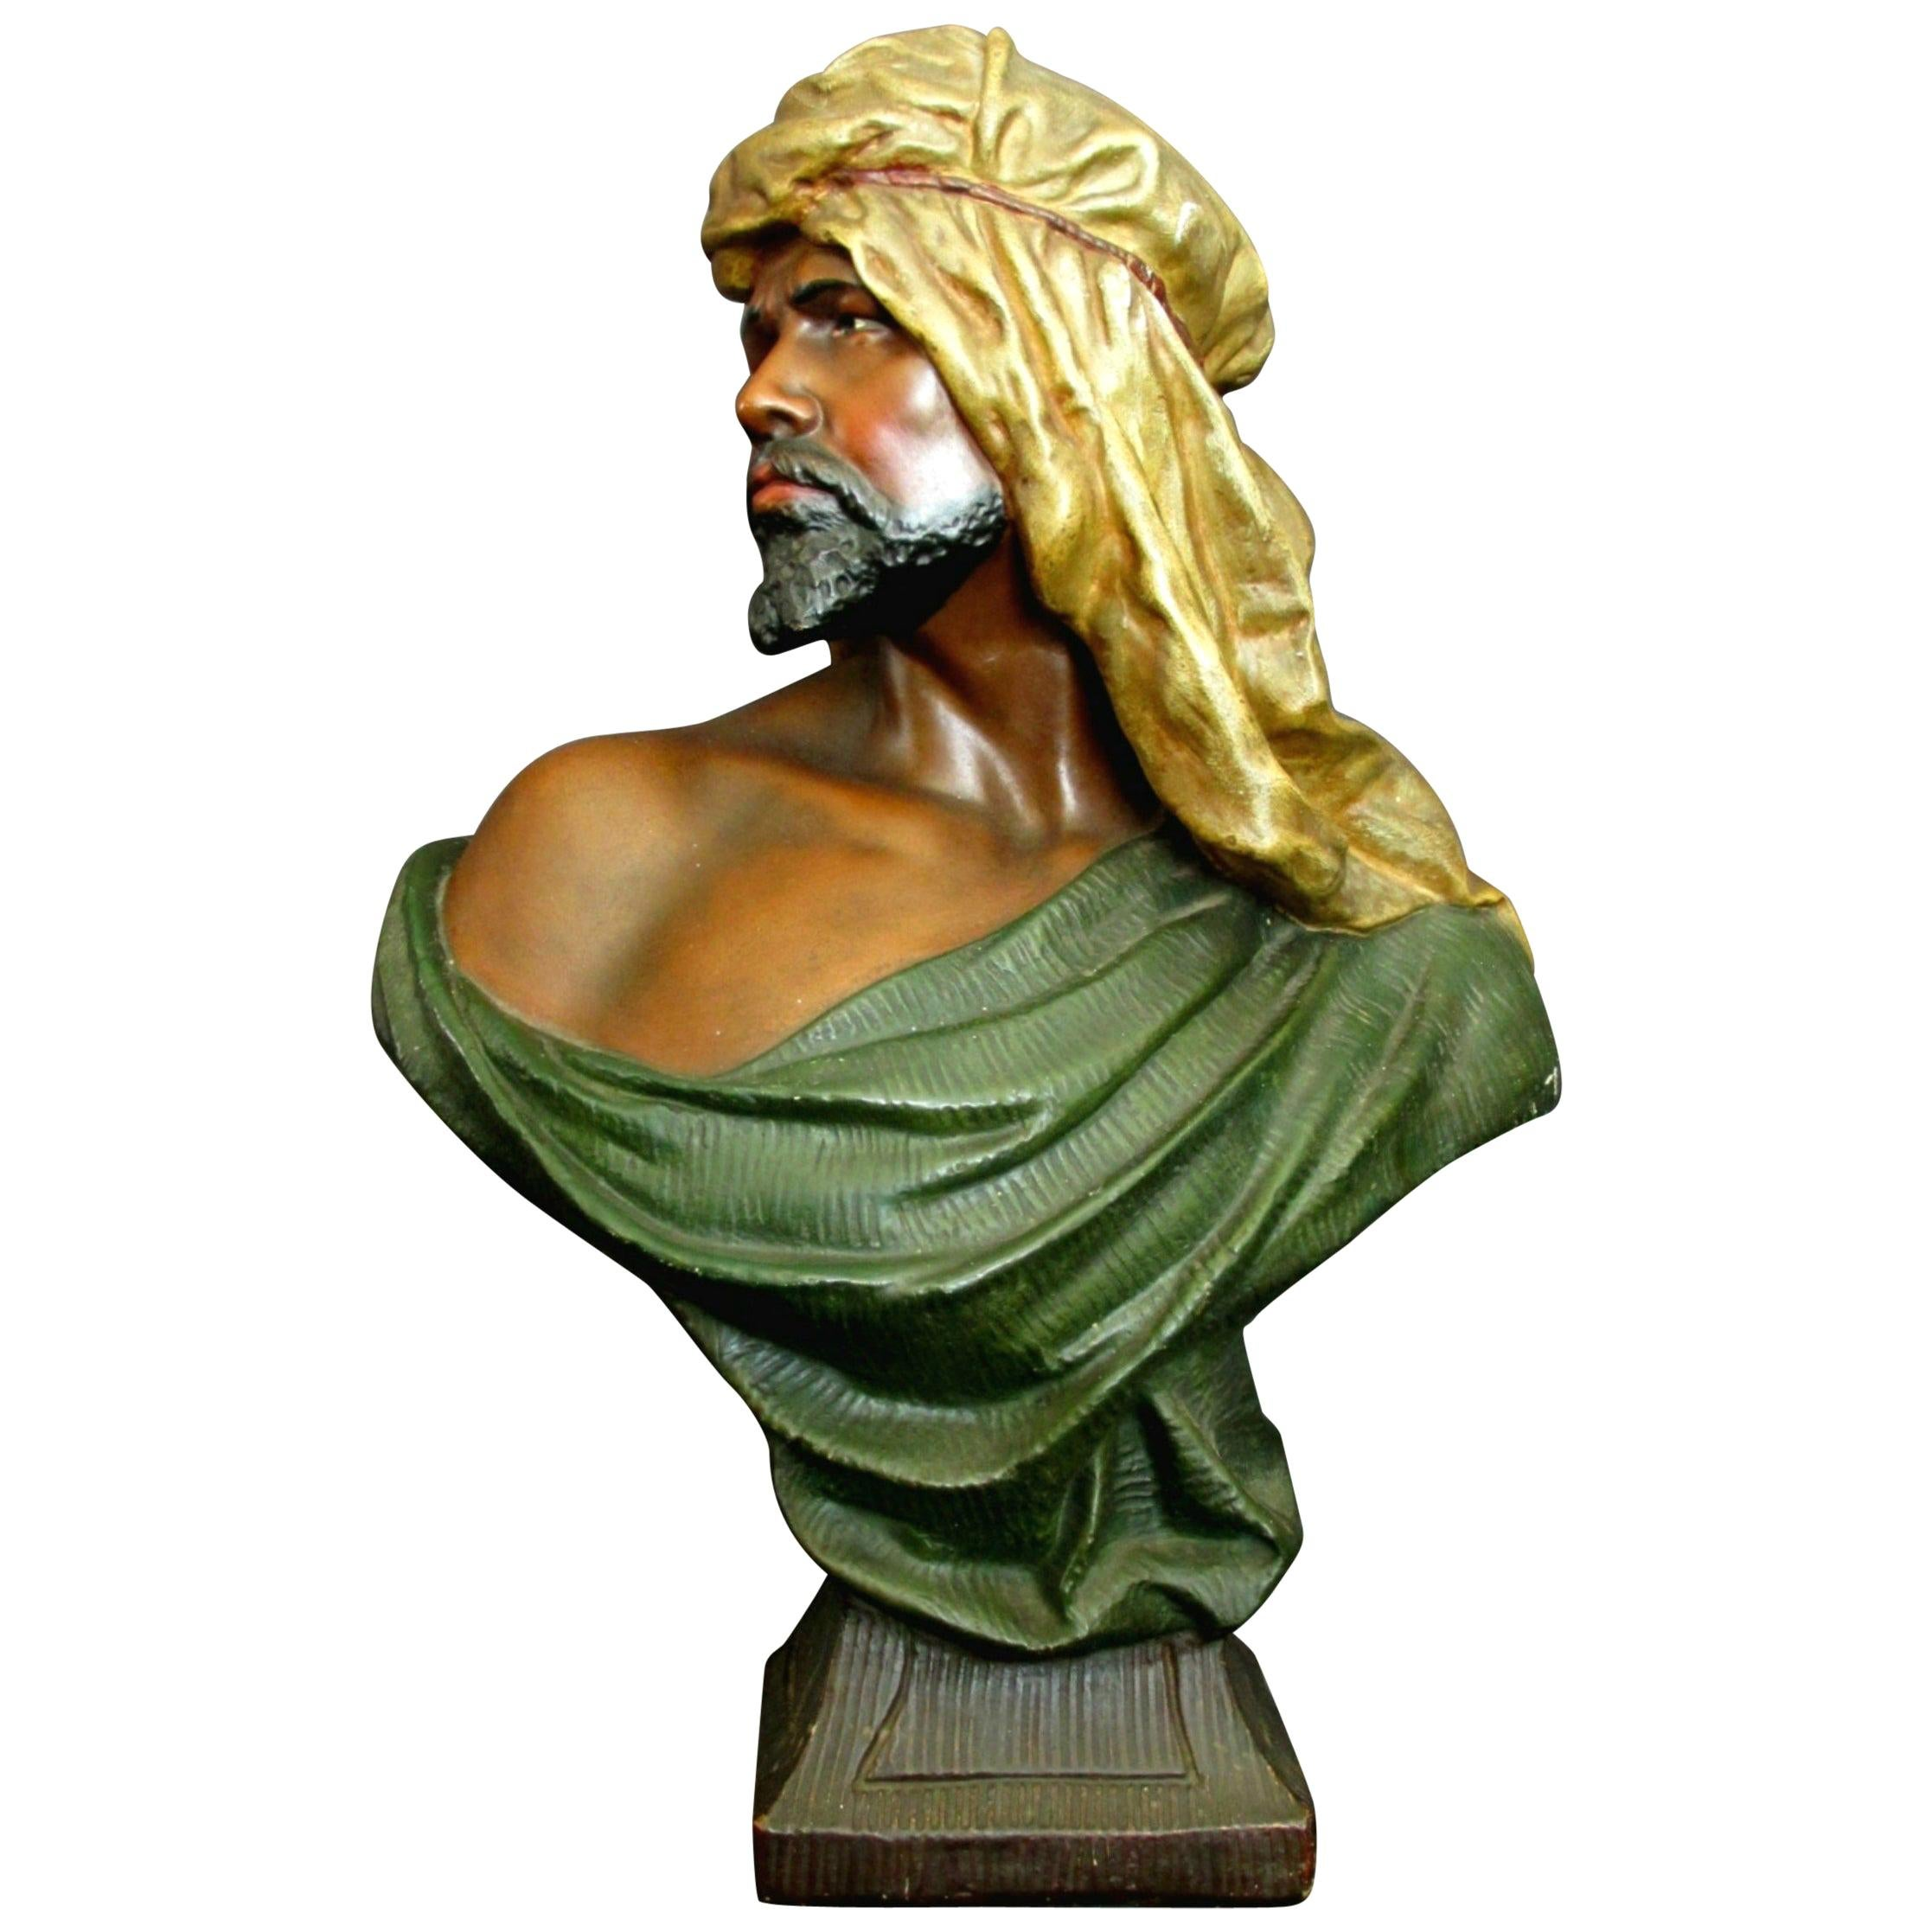 Early 20th Century Orientalist Plaster Bust of a Moor, Austria, circa 1920